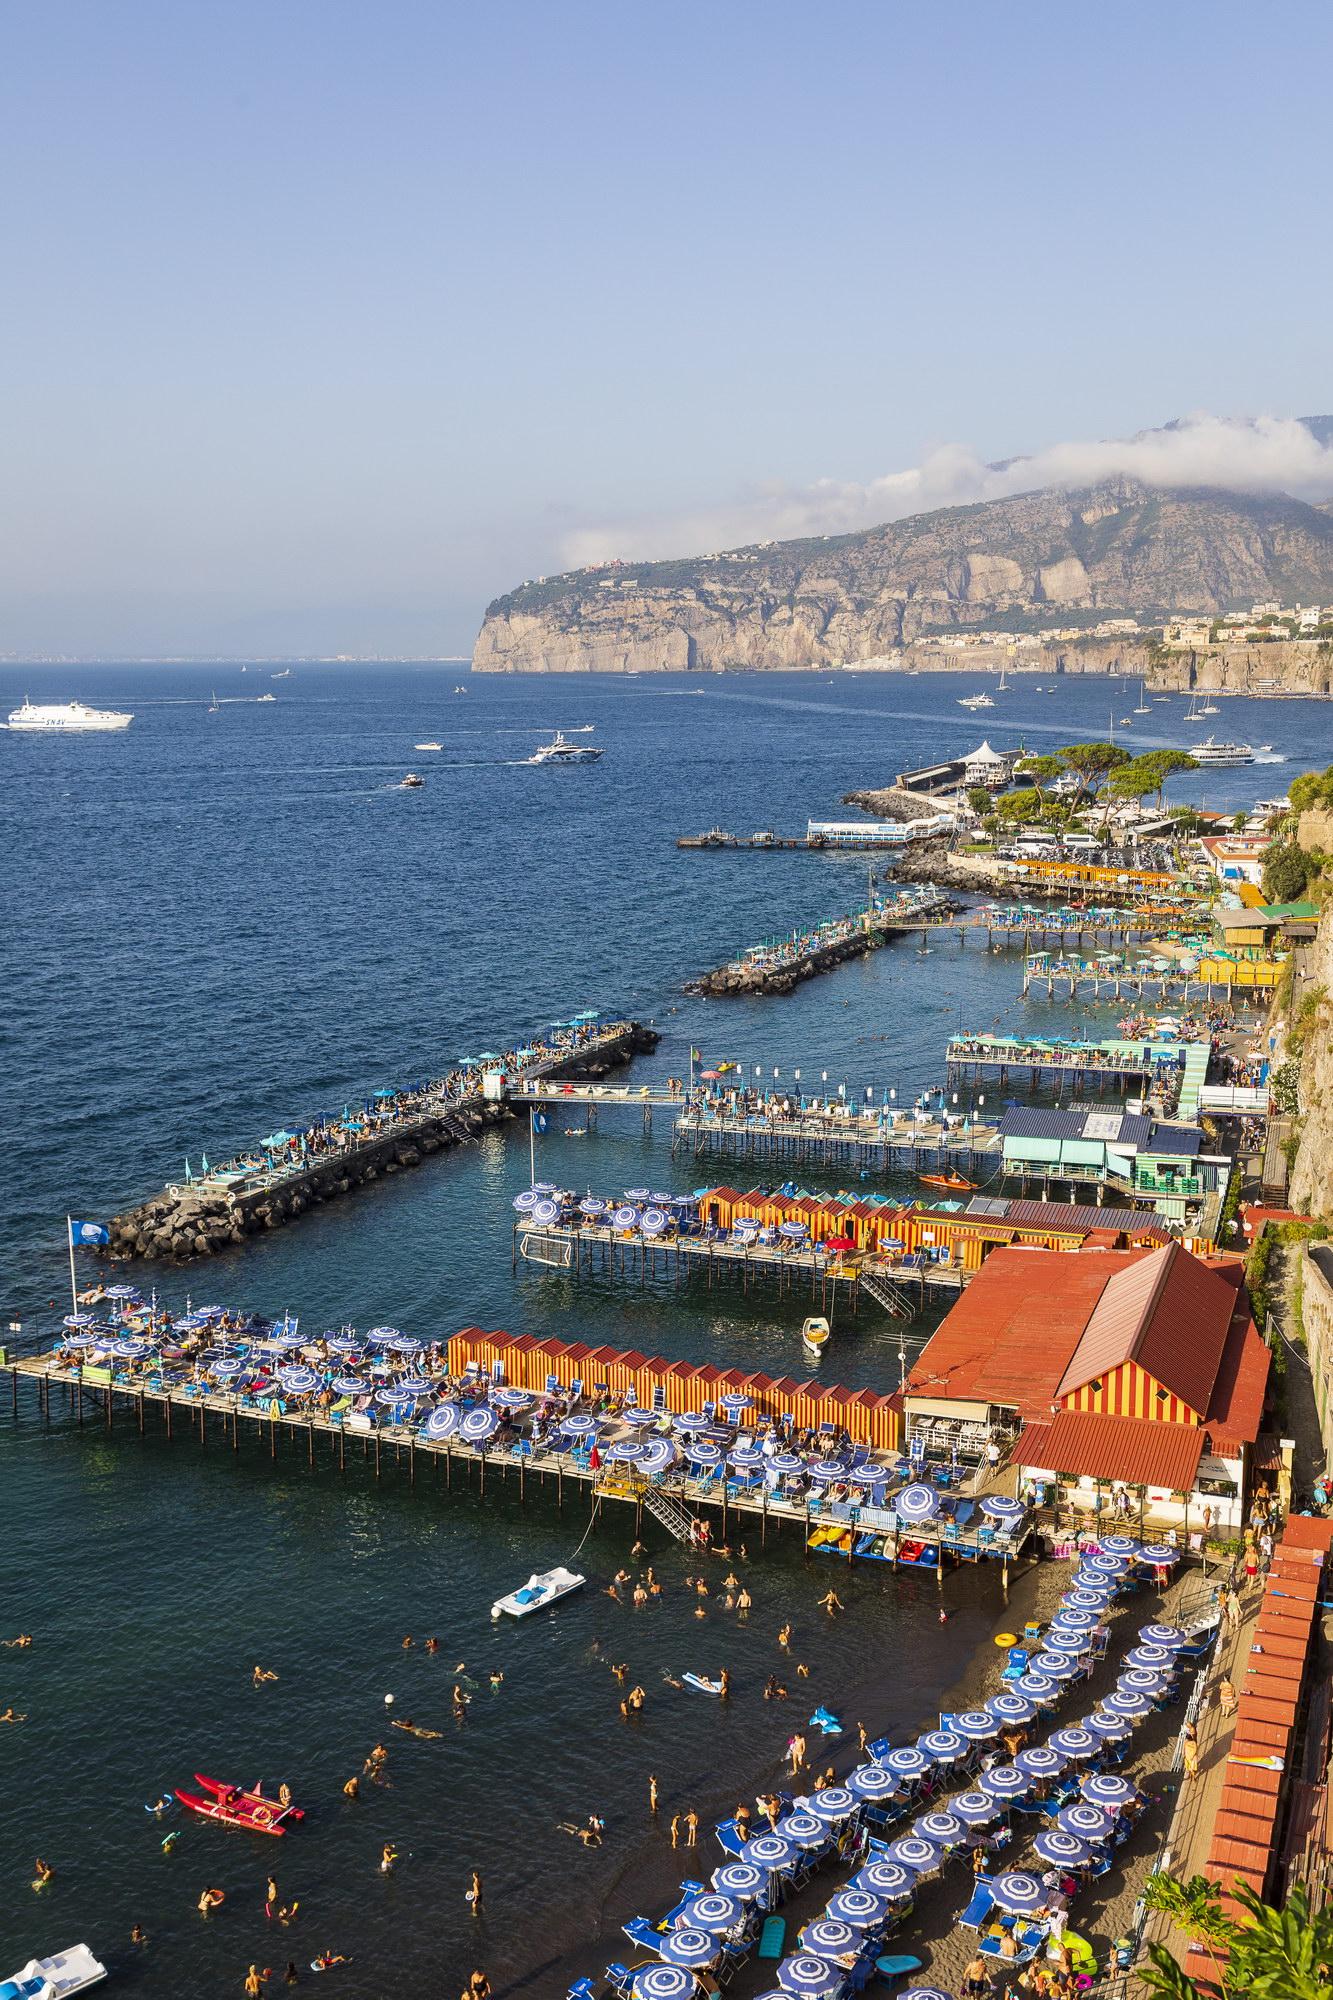 Seaside Engagement in Sorrento Andrea Matone01